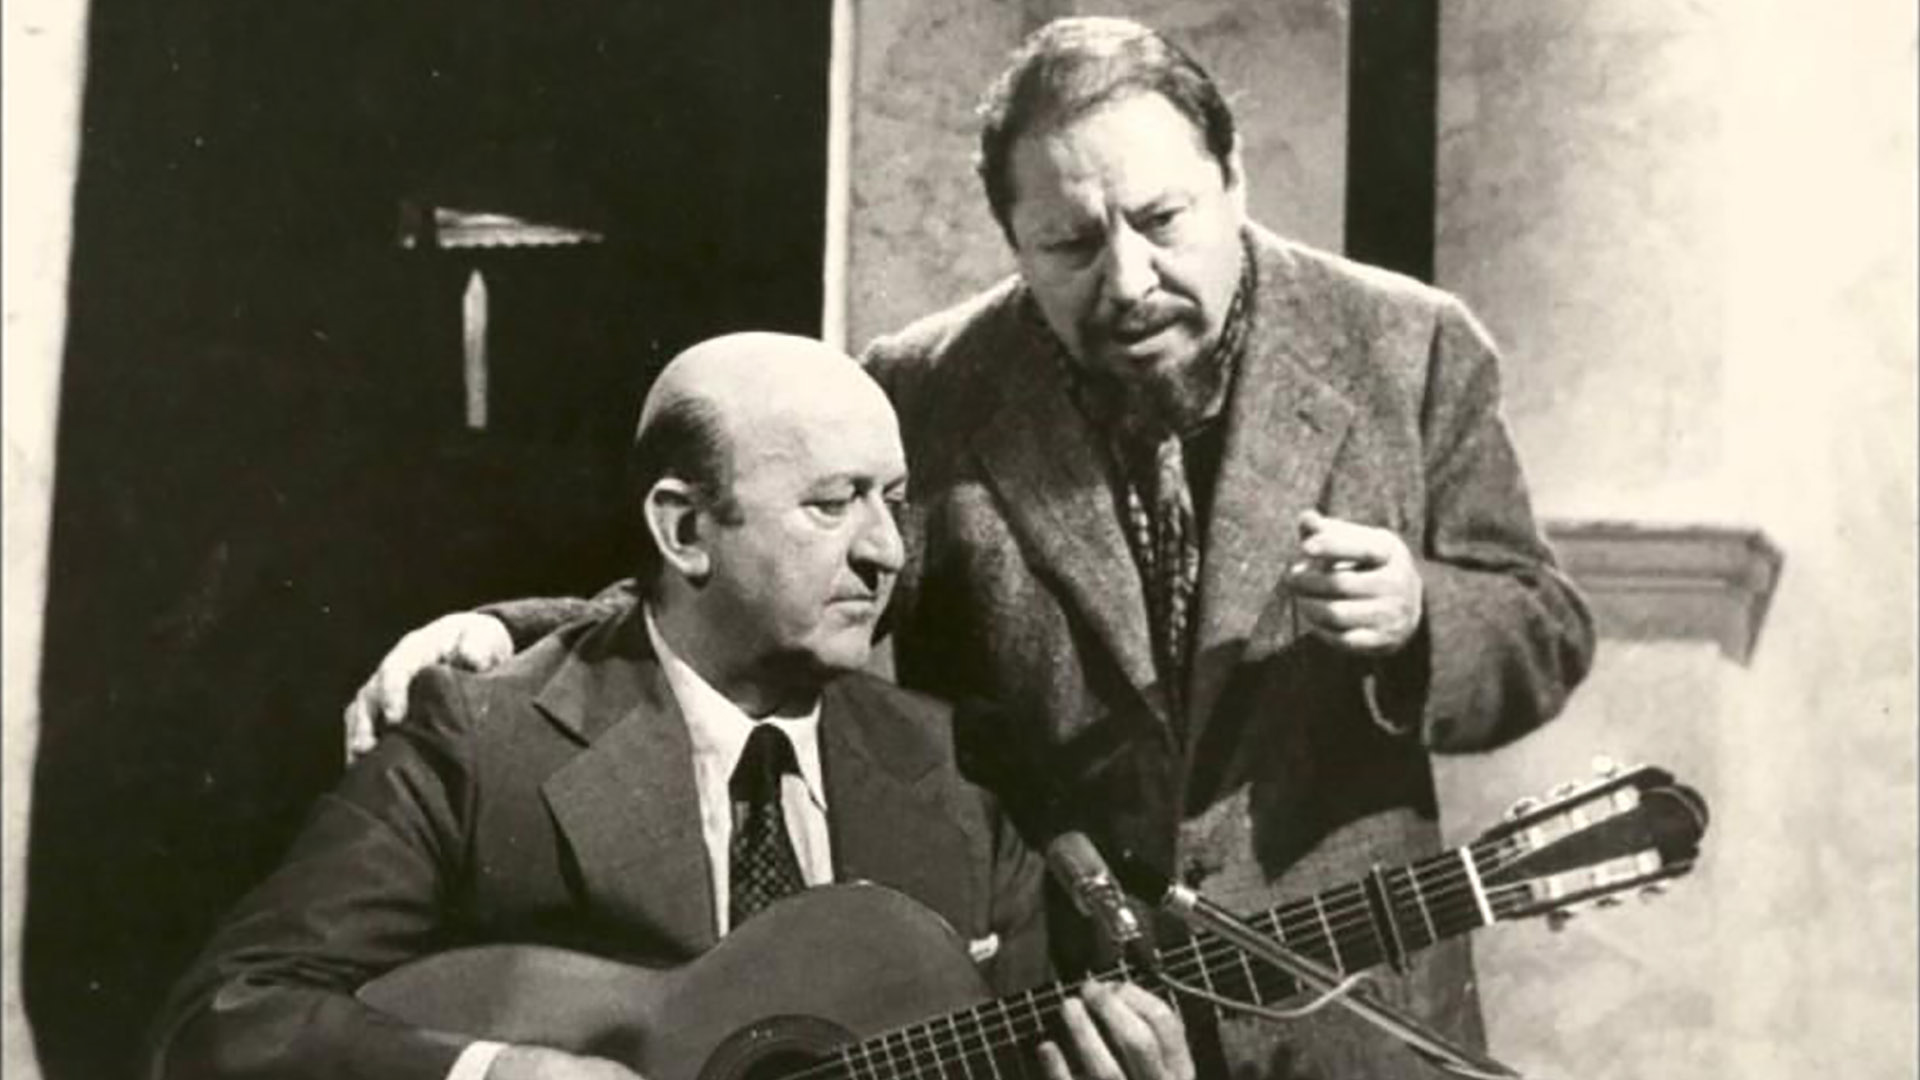 Eduardo Falú (guitarrista) y Jaime Dávalos (recitador y cantor).